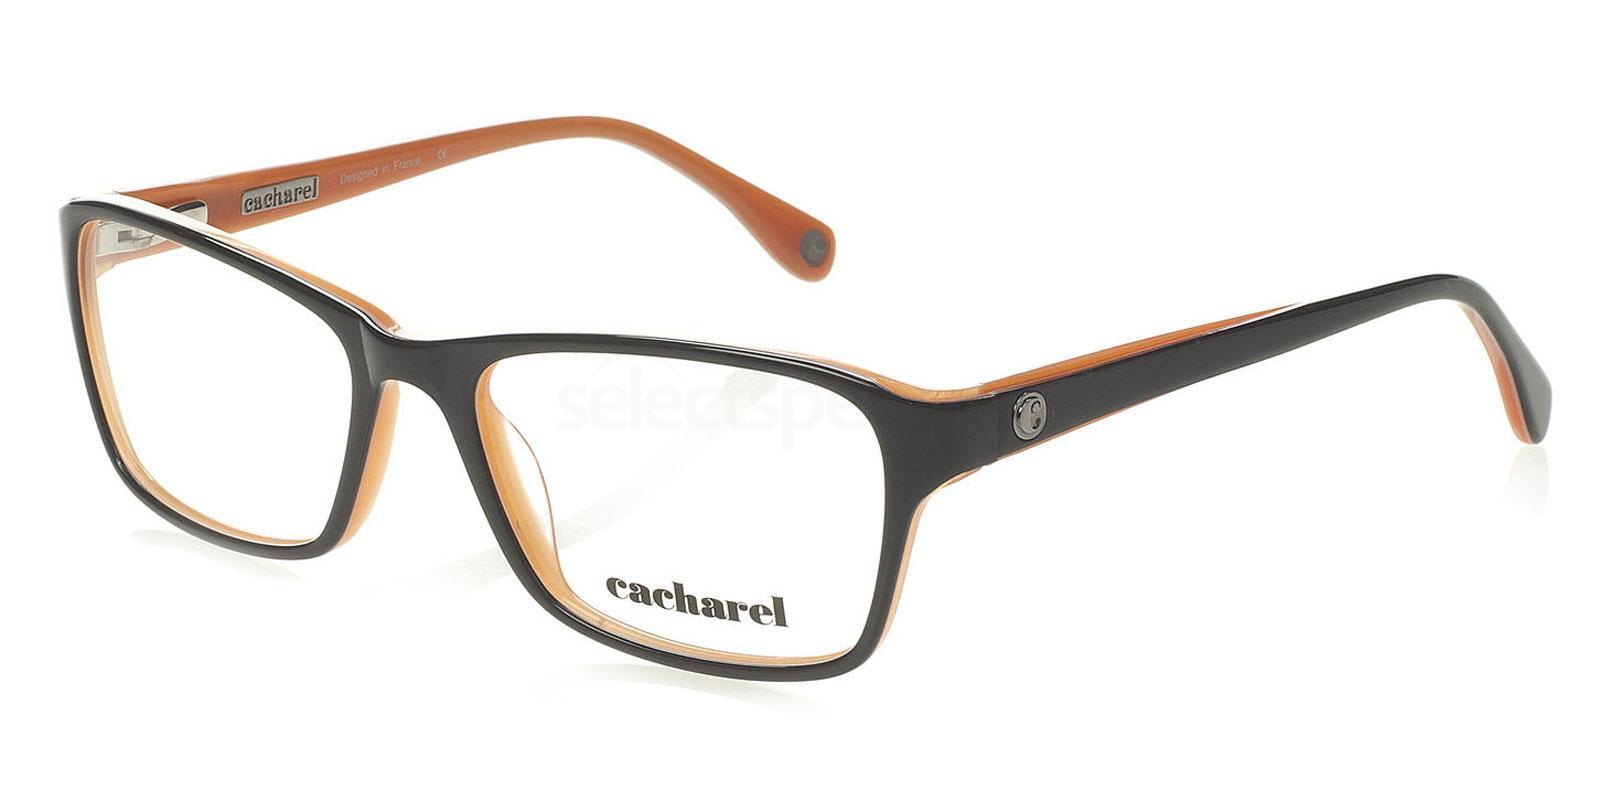 003 CA3018 Glasses, Cacharel